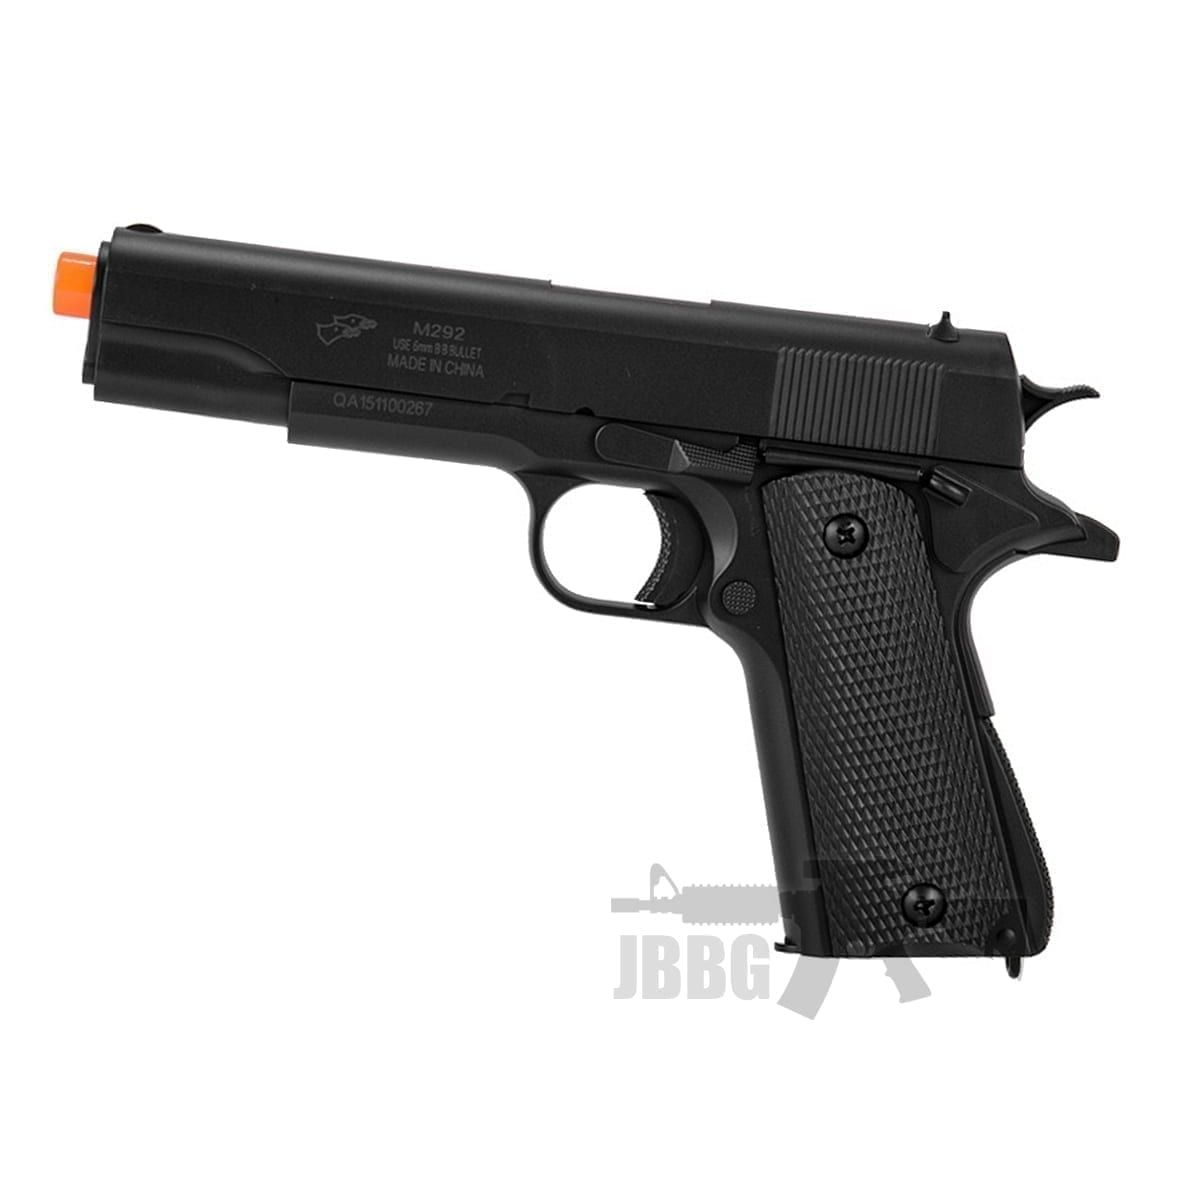 m292 airsoft pistol